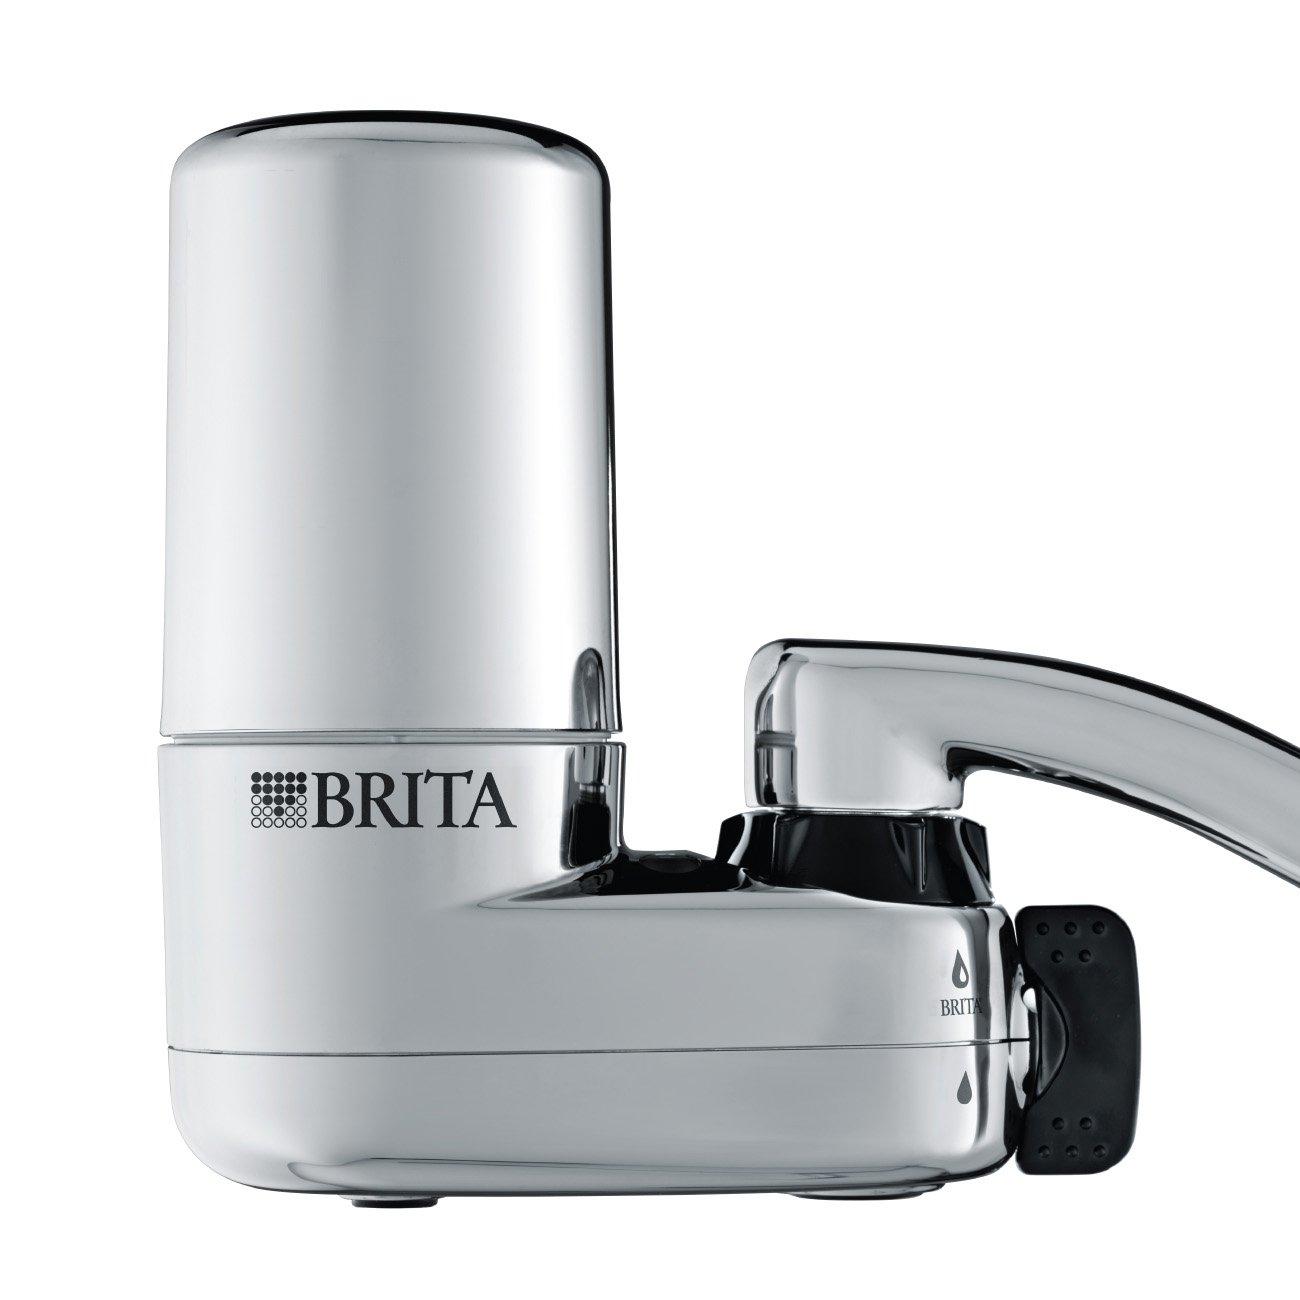 new brita water kitchen counter sink filtration system tap